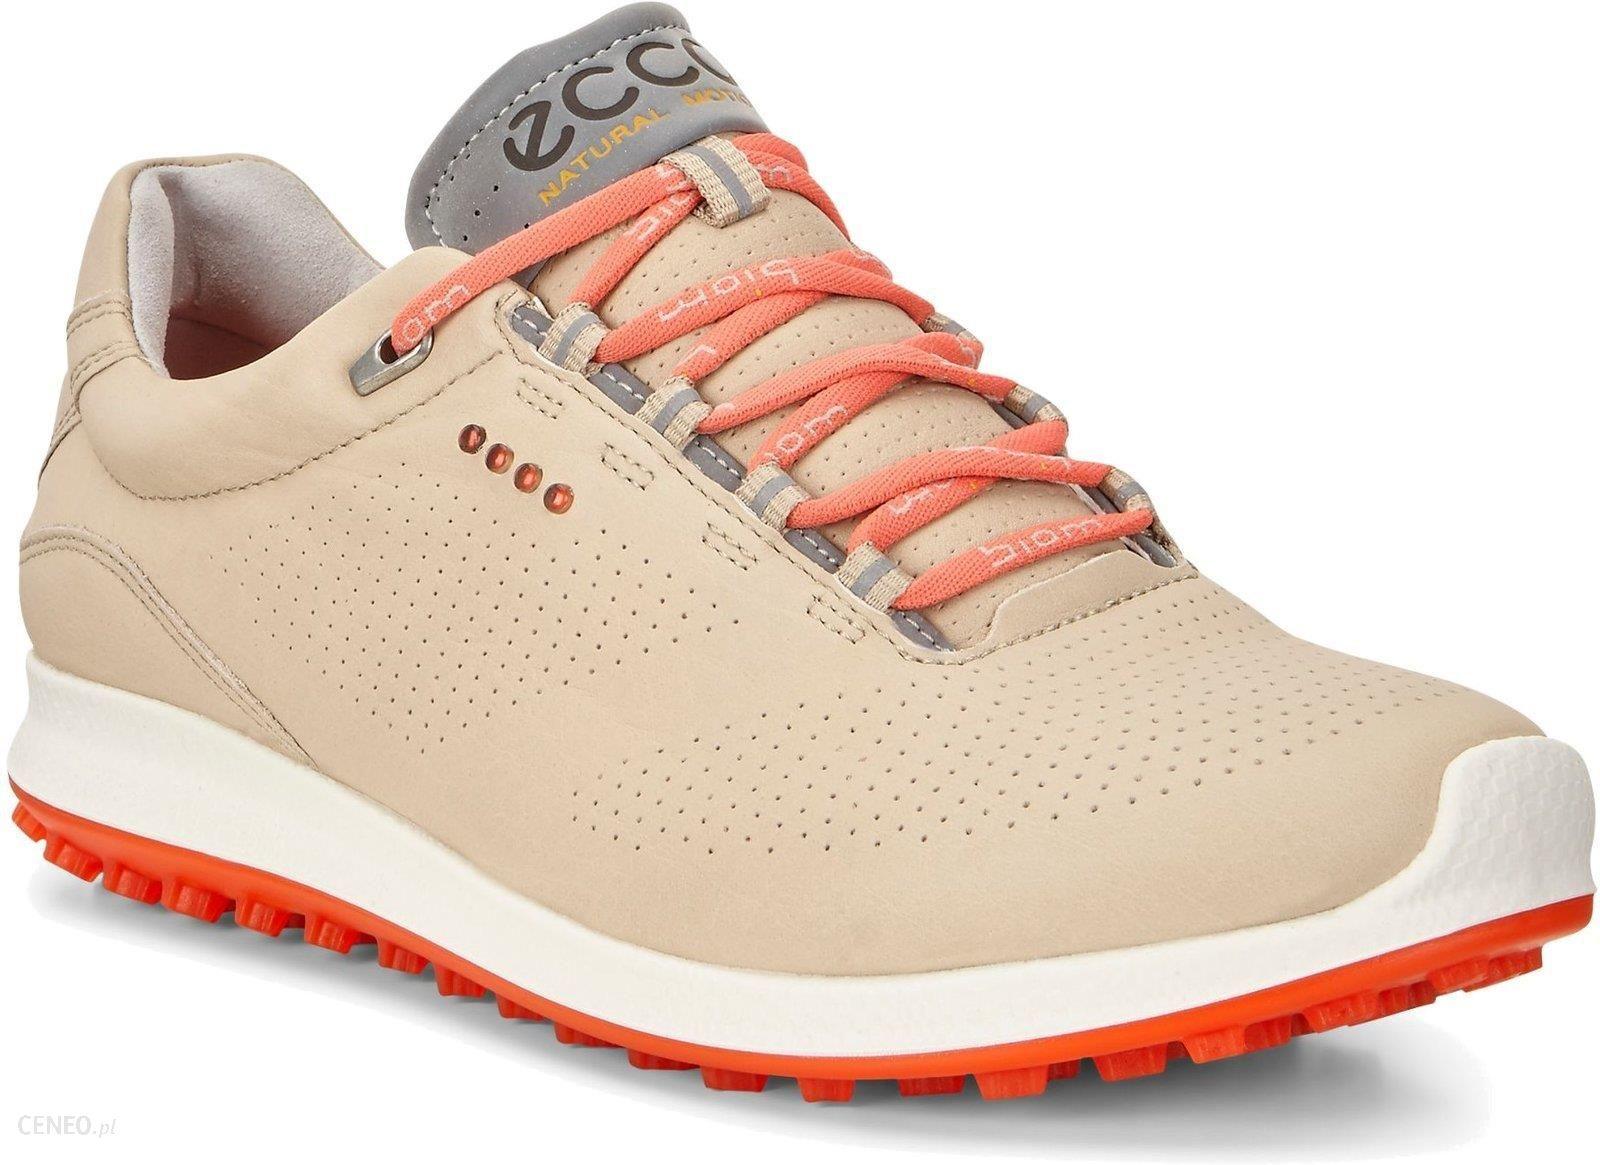 Ecco Golf Biom Hybrid 2 Oyester Coral Blu Womens Ceny i opinie Ceneo.pl